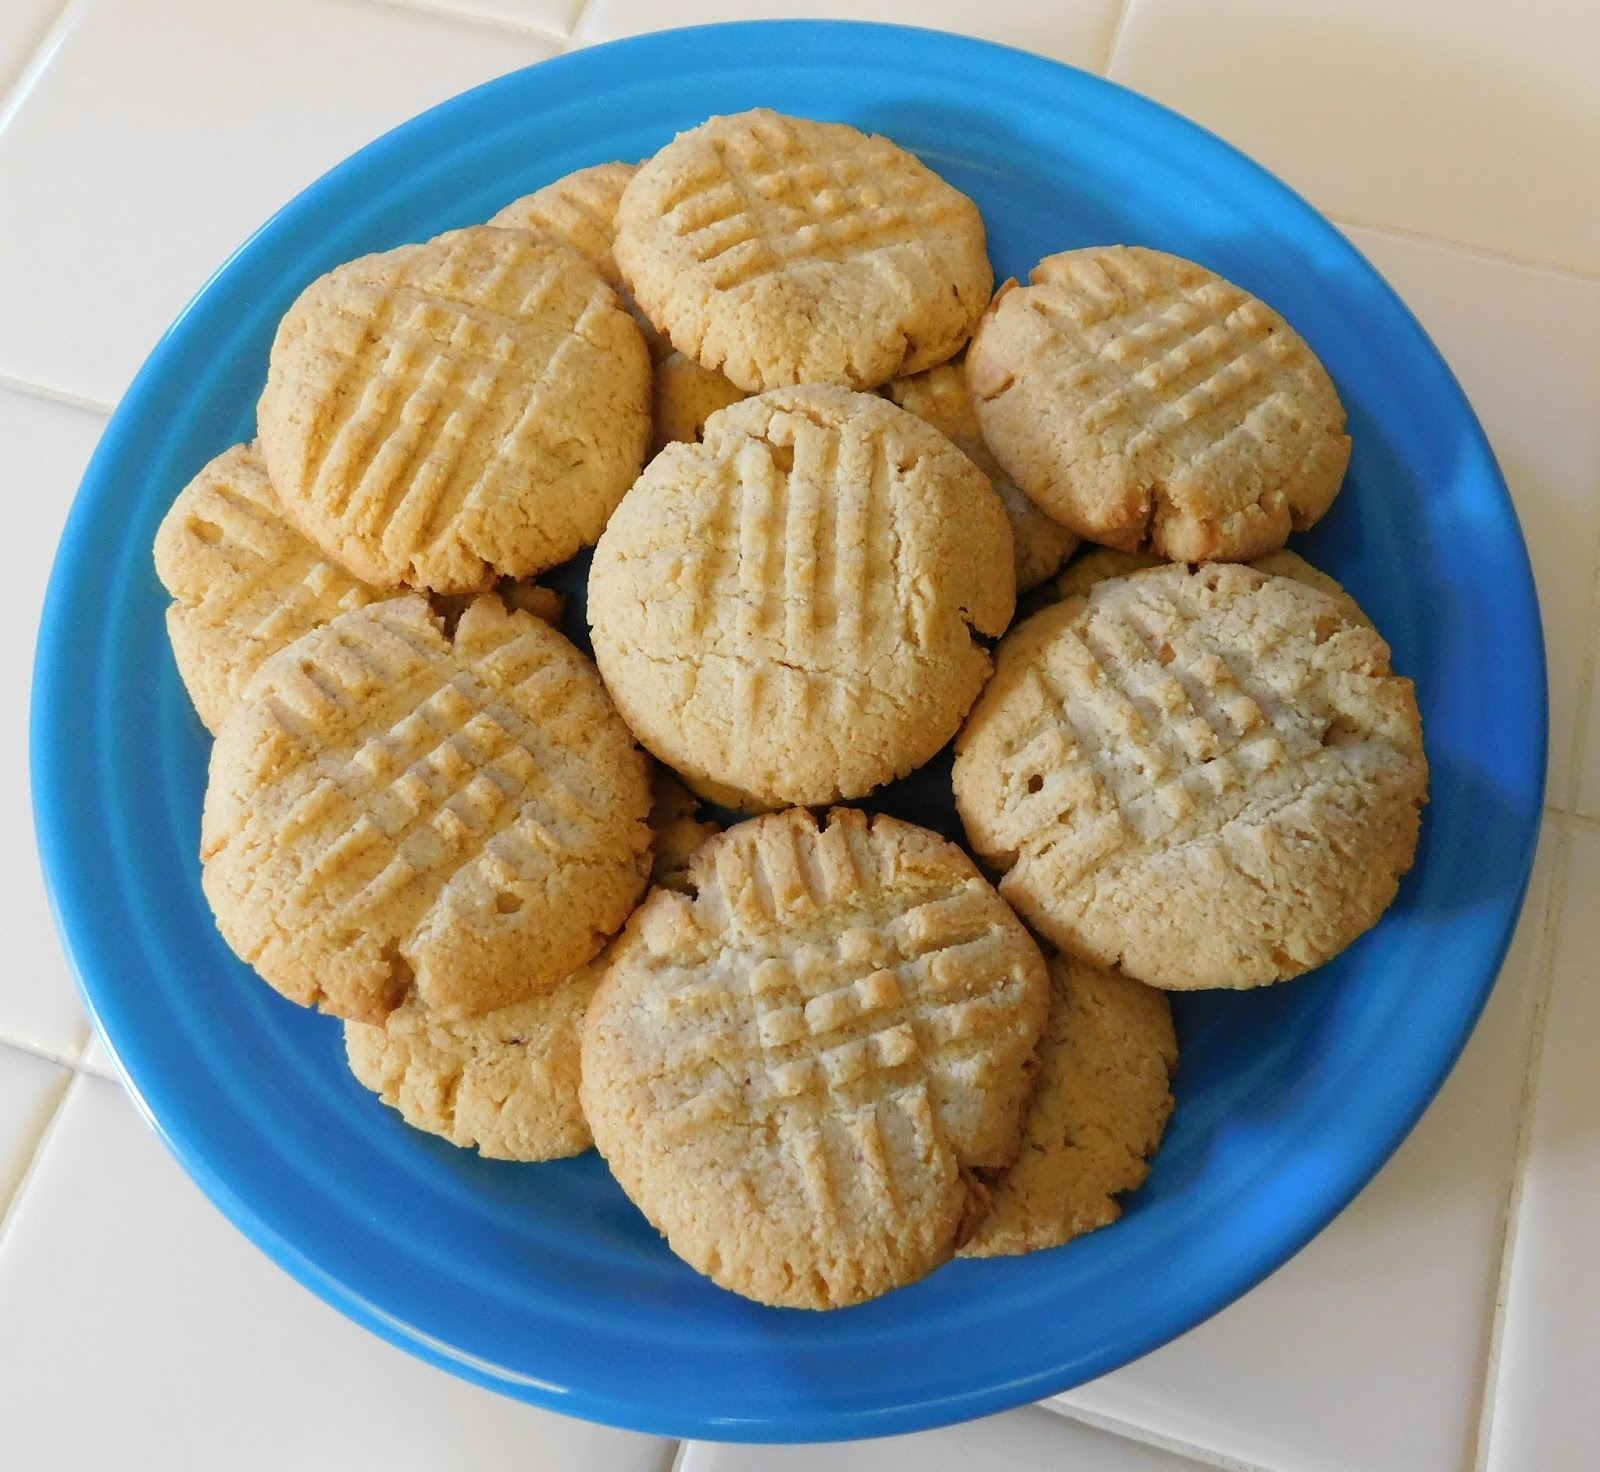 Theworldaccordingtoeggface The Best Sugar Free Peanut Butter Cookies